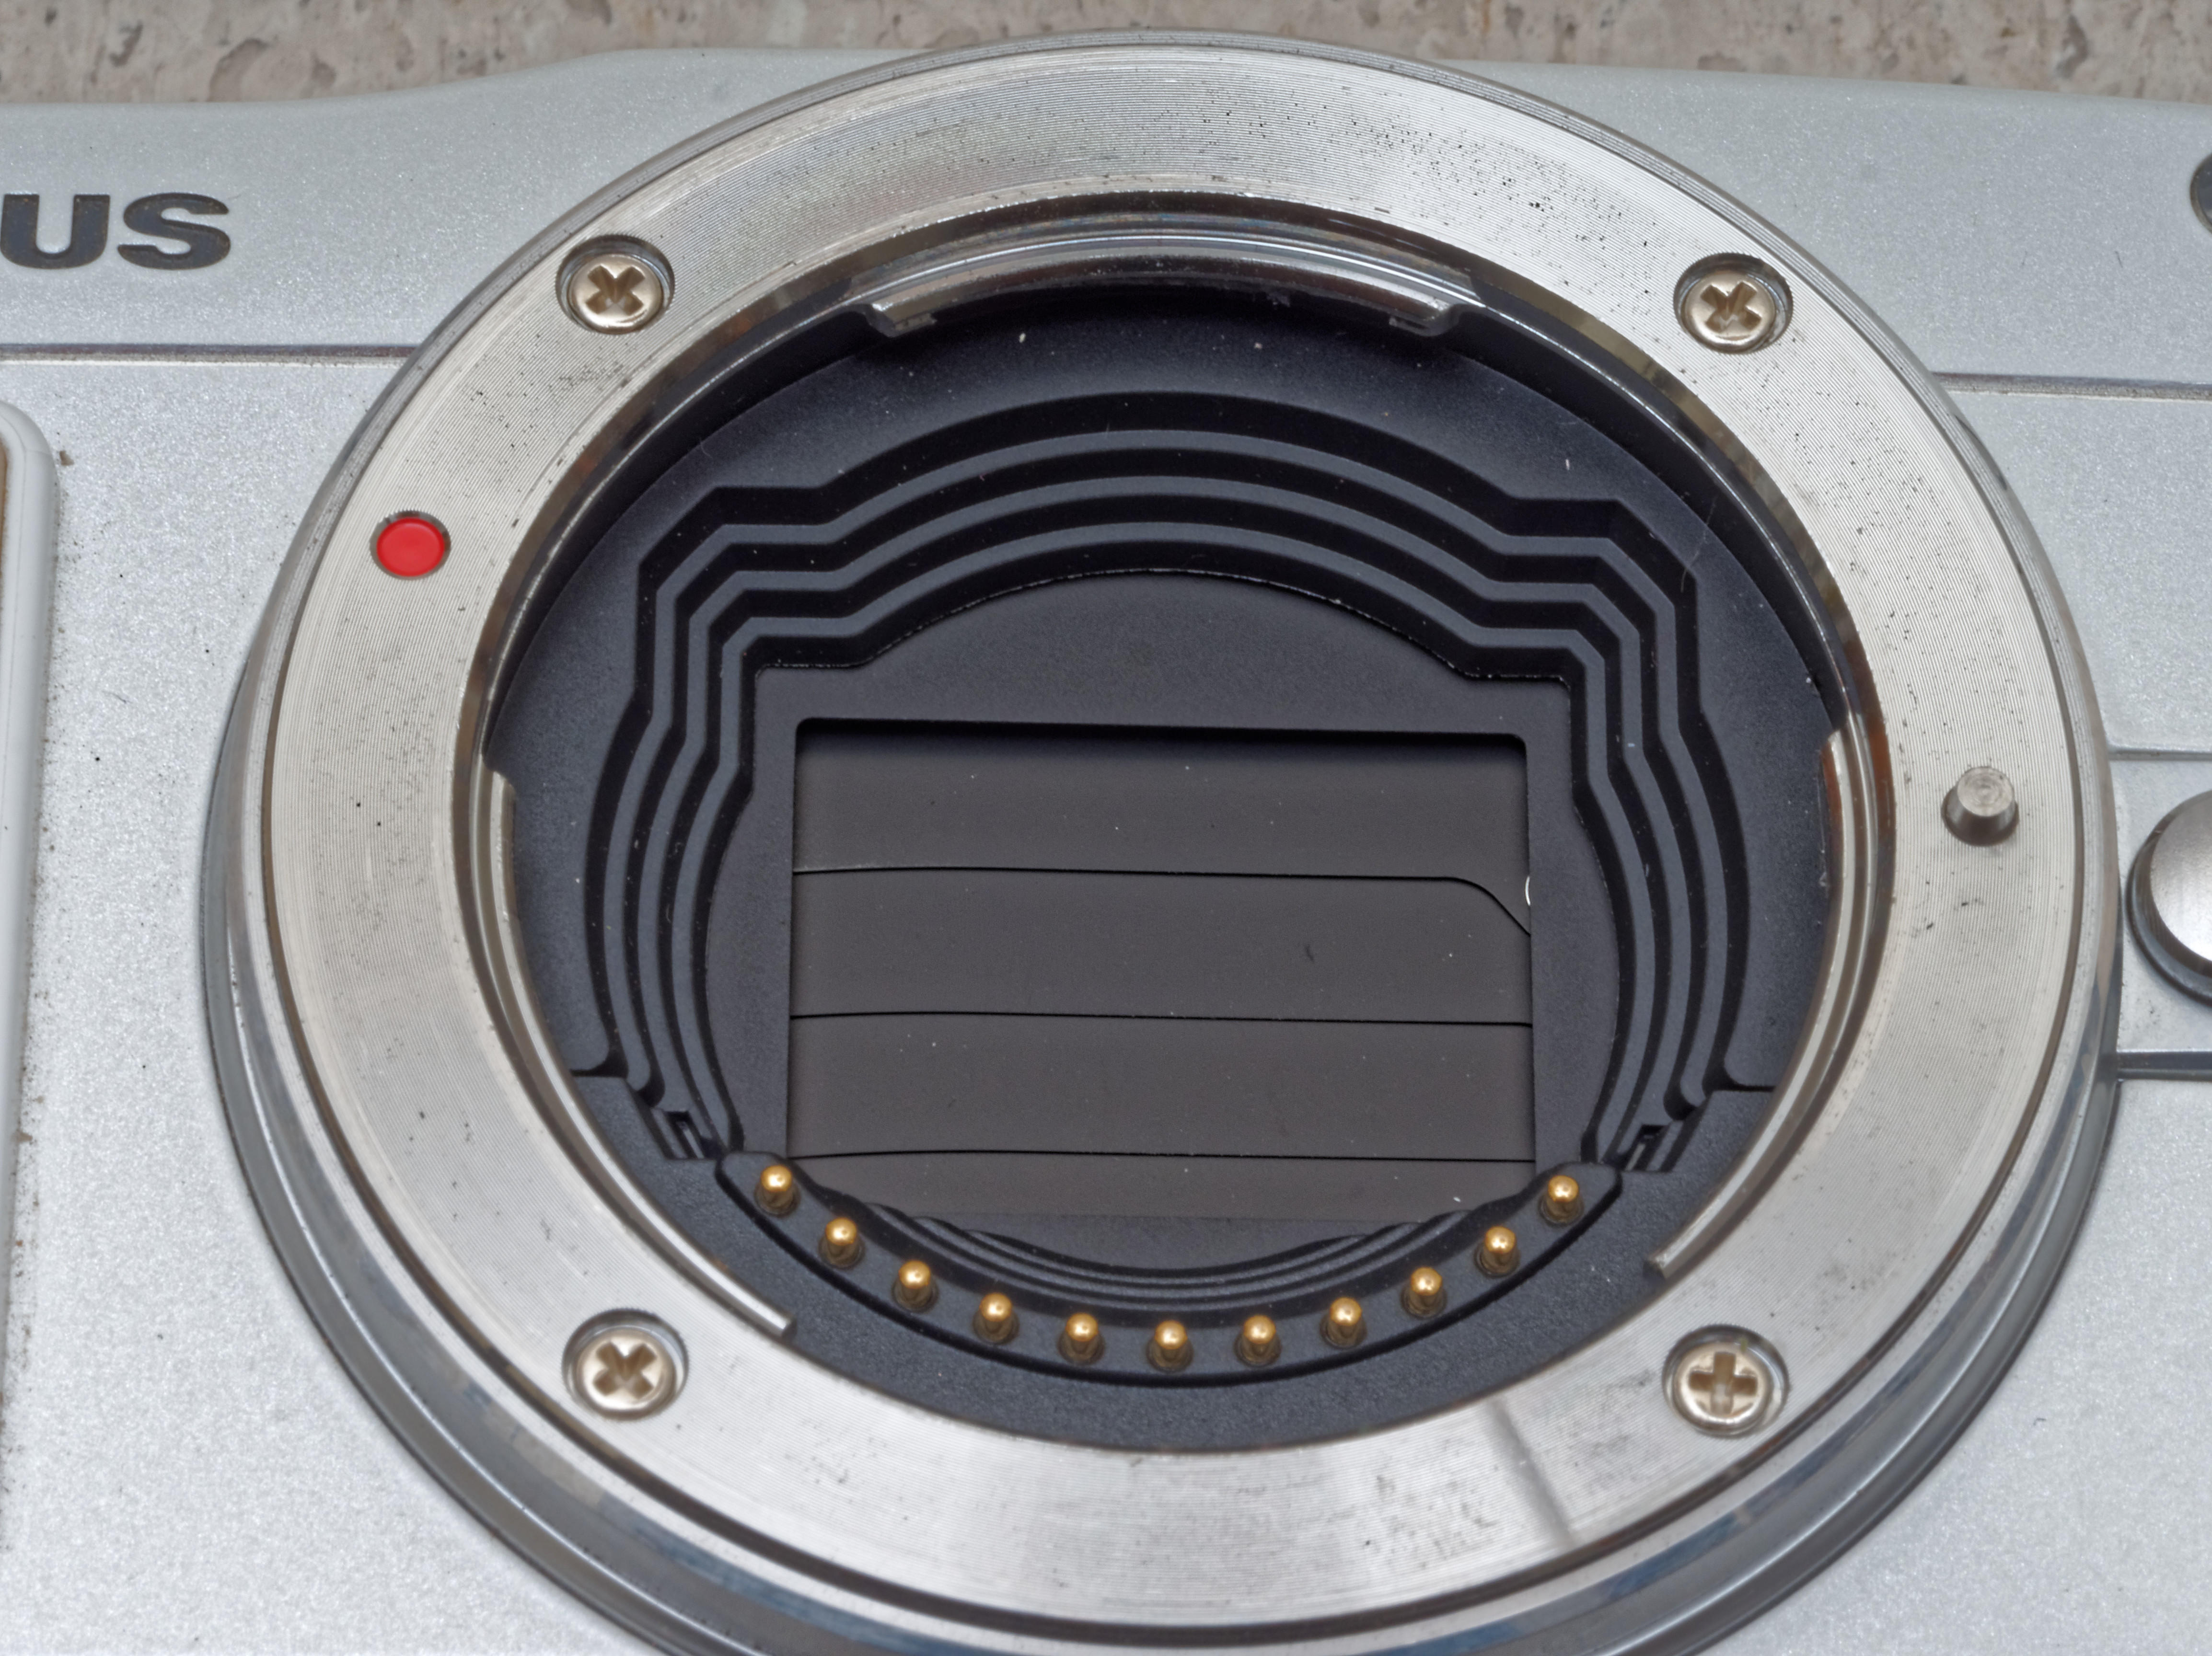 E-MP2-Shutter-1.jpeg